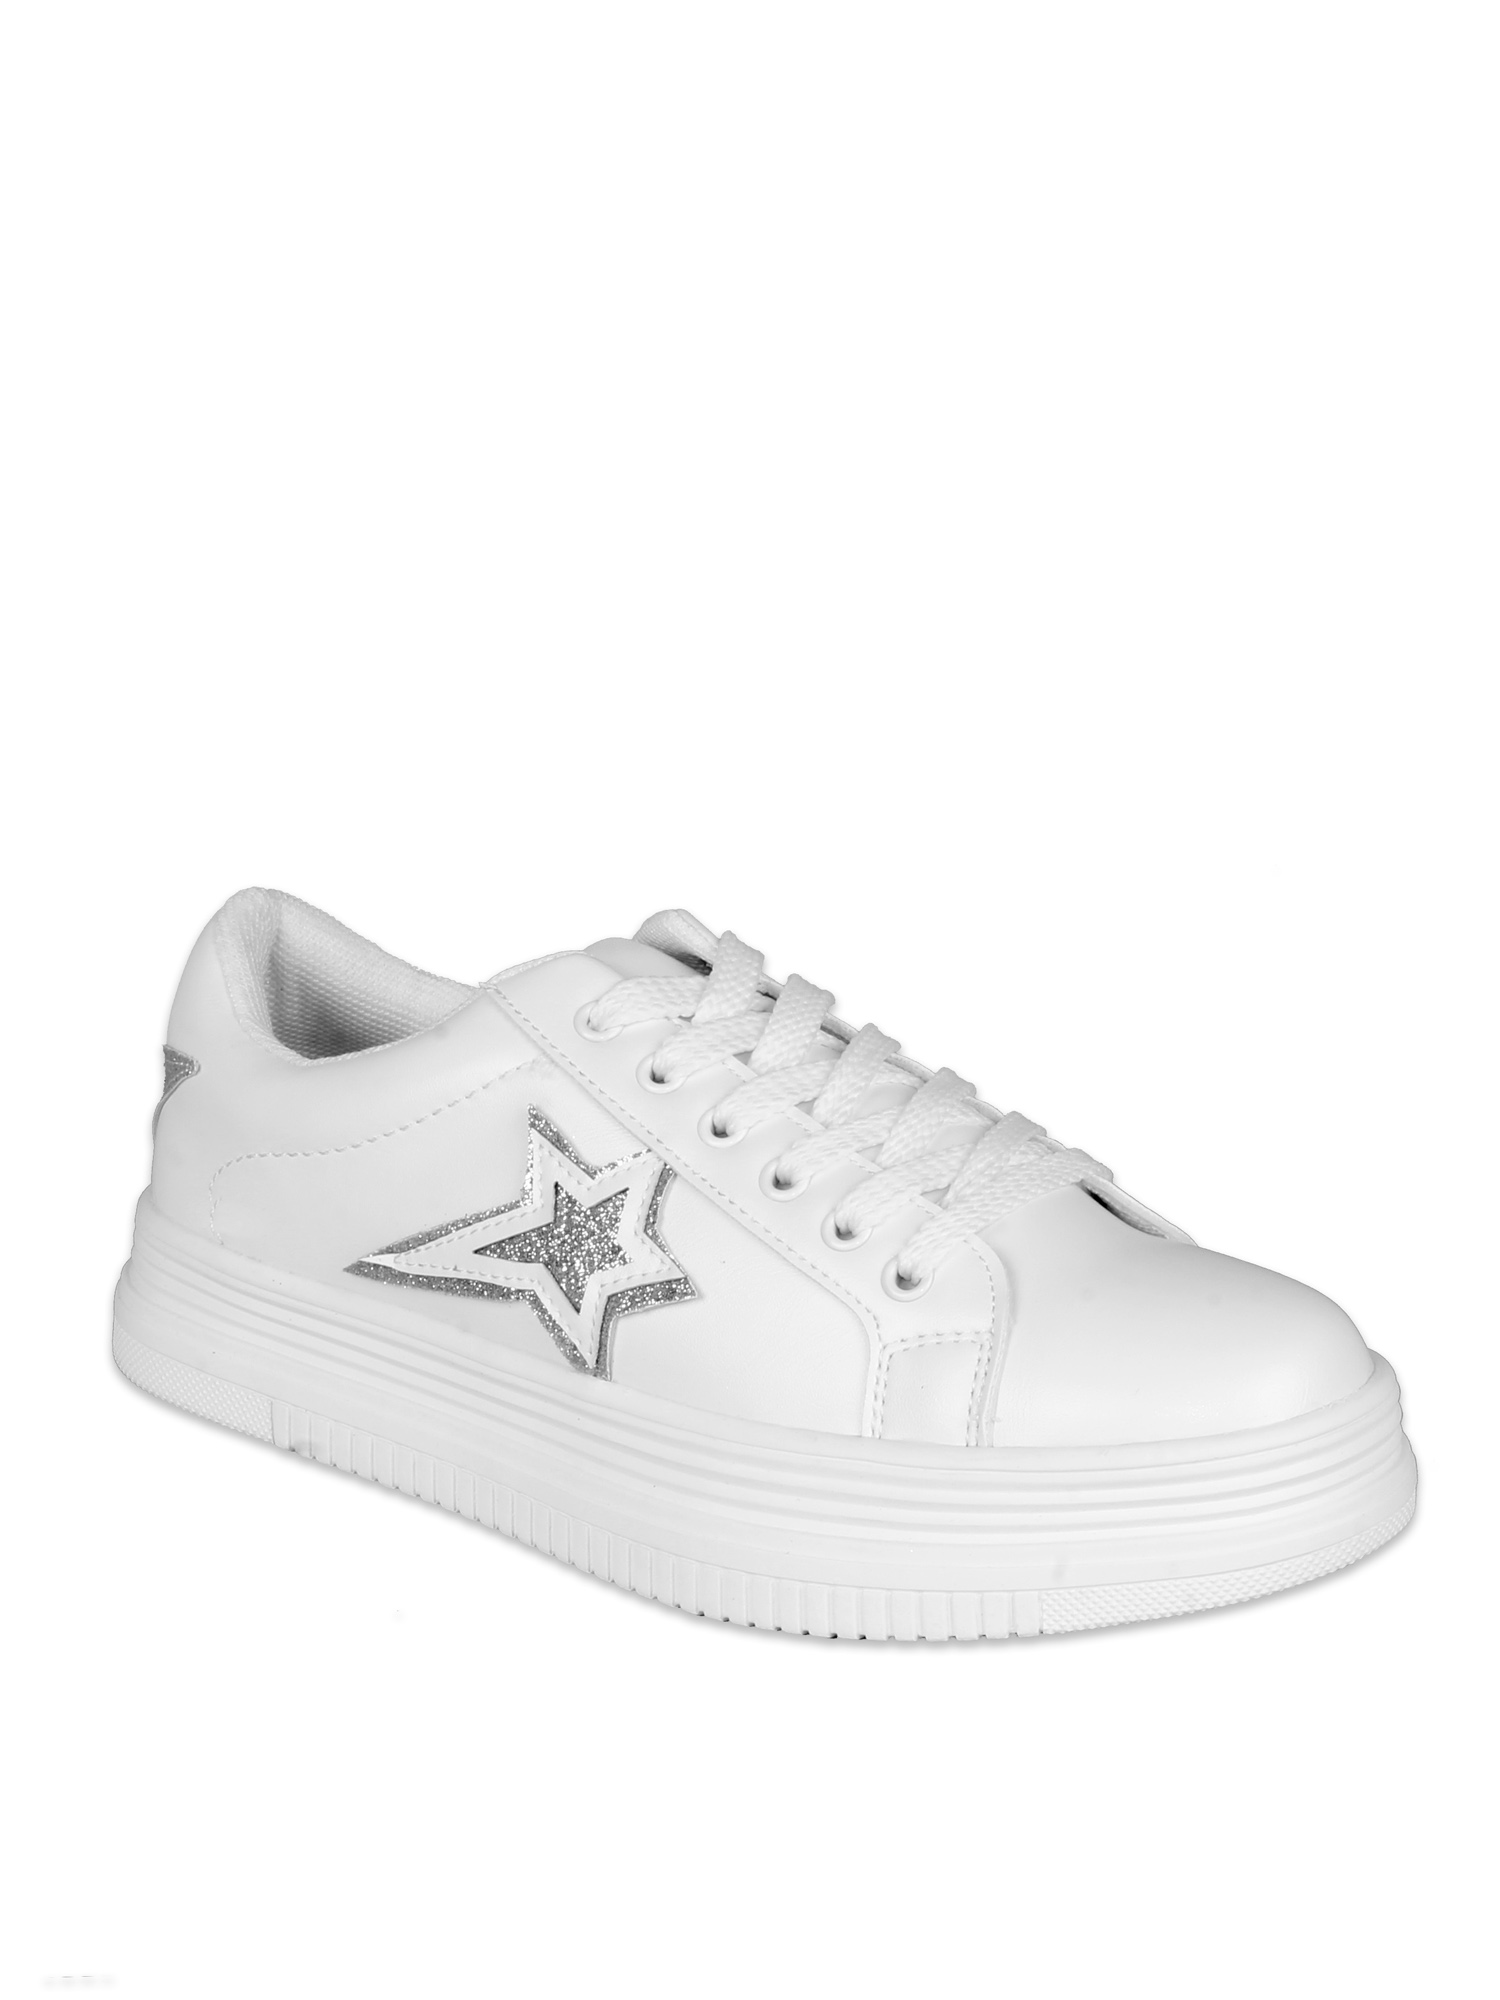 women's platform sneakers white